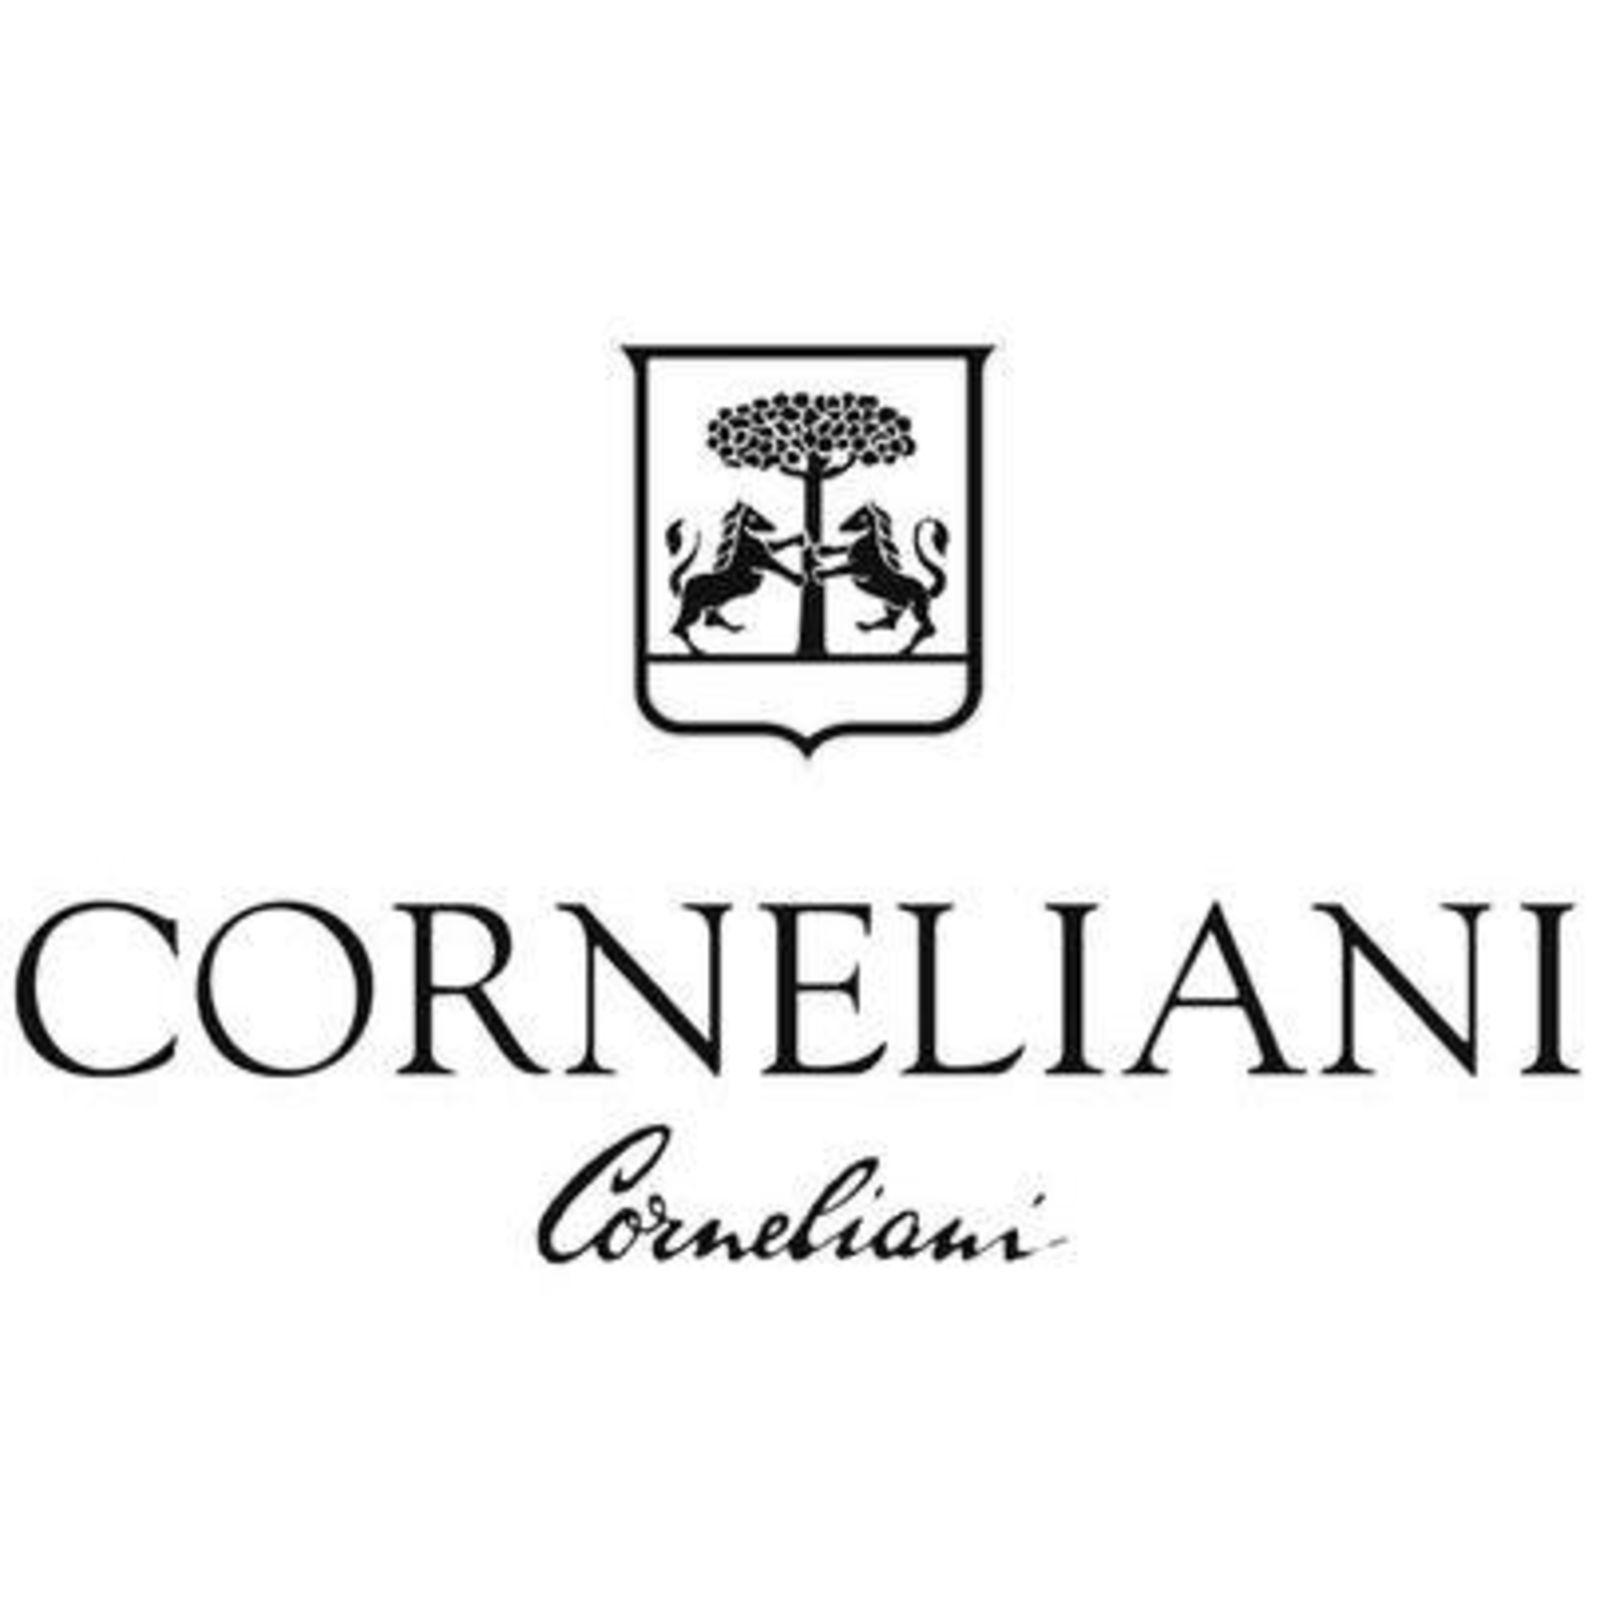 CORNELIANI (Изображение 1)